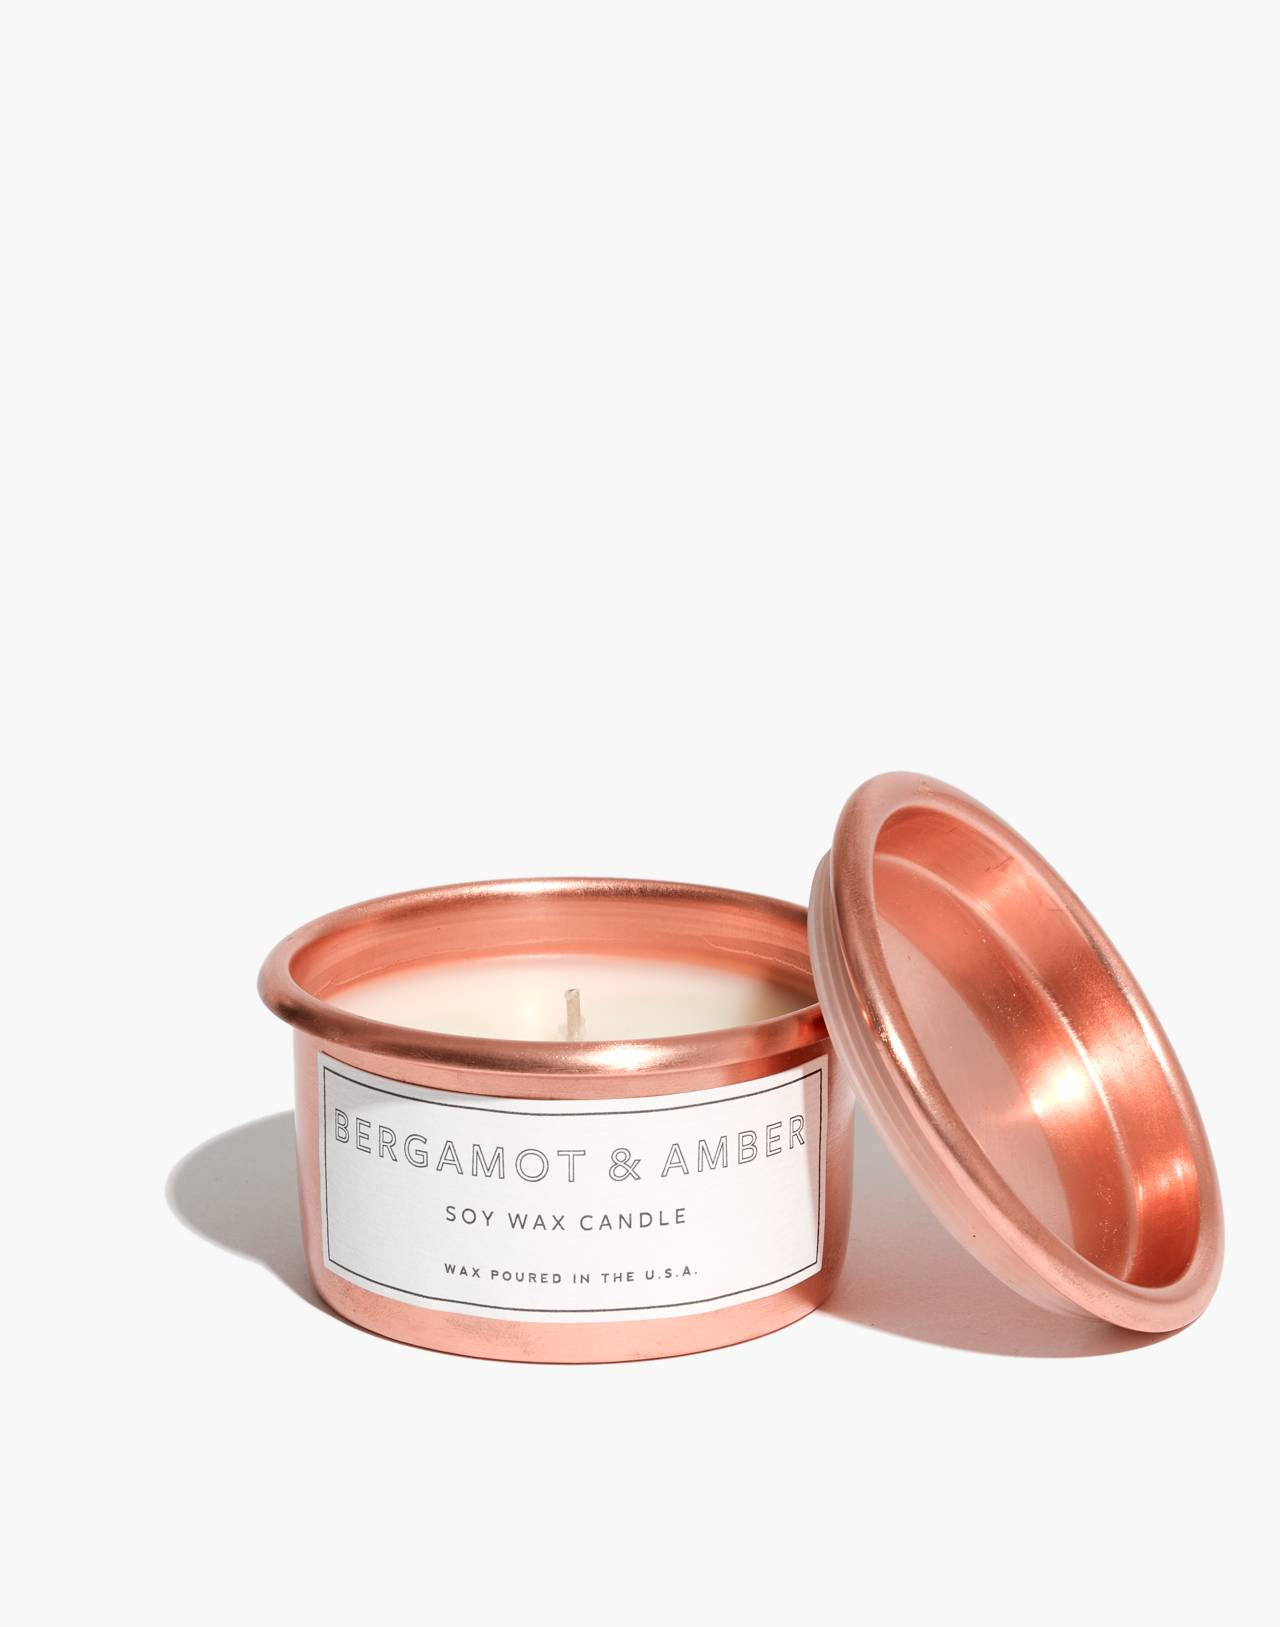 Mini Metal Tumbler Candle in bergamot amber image 1